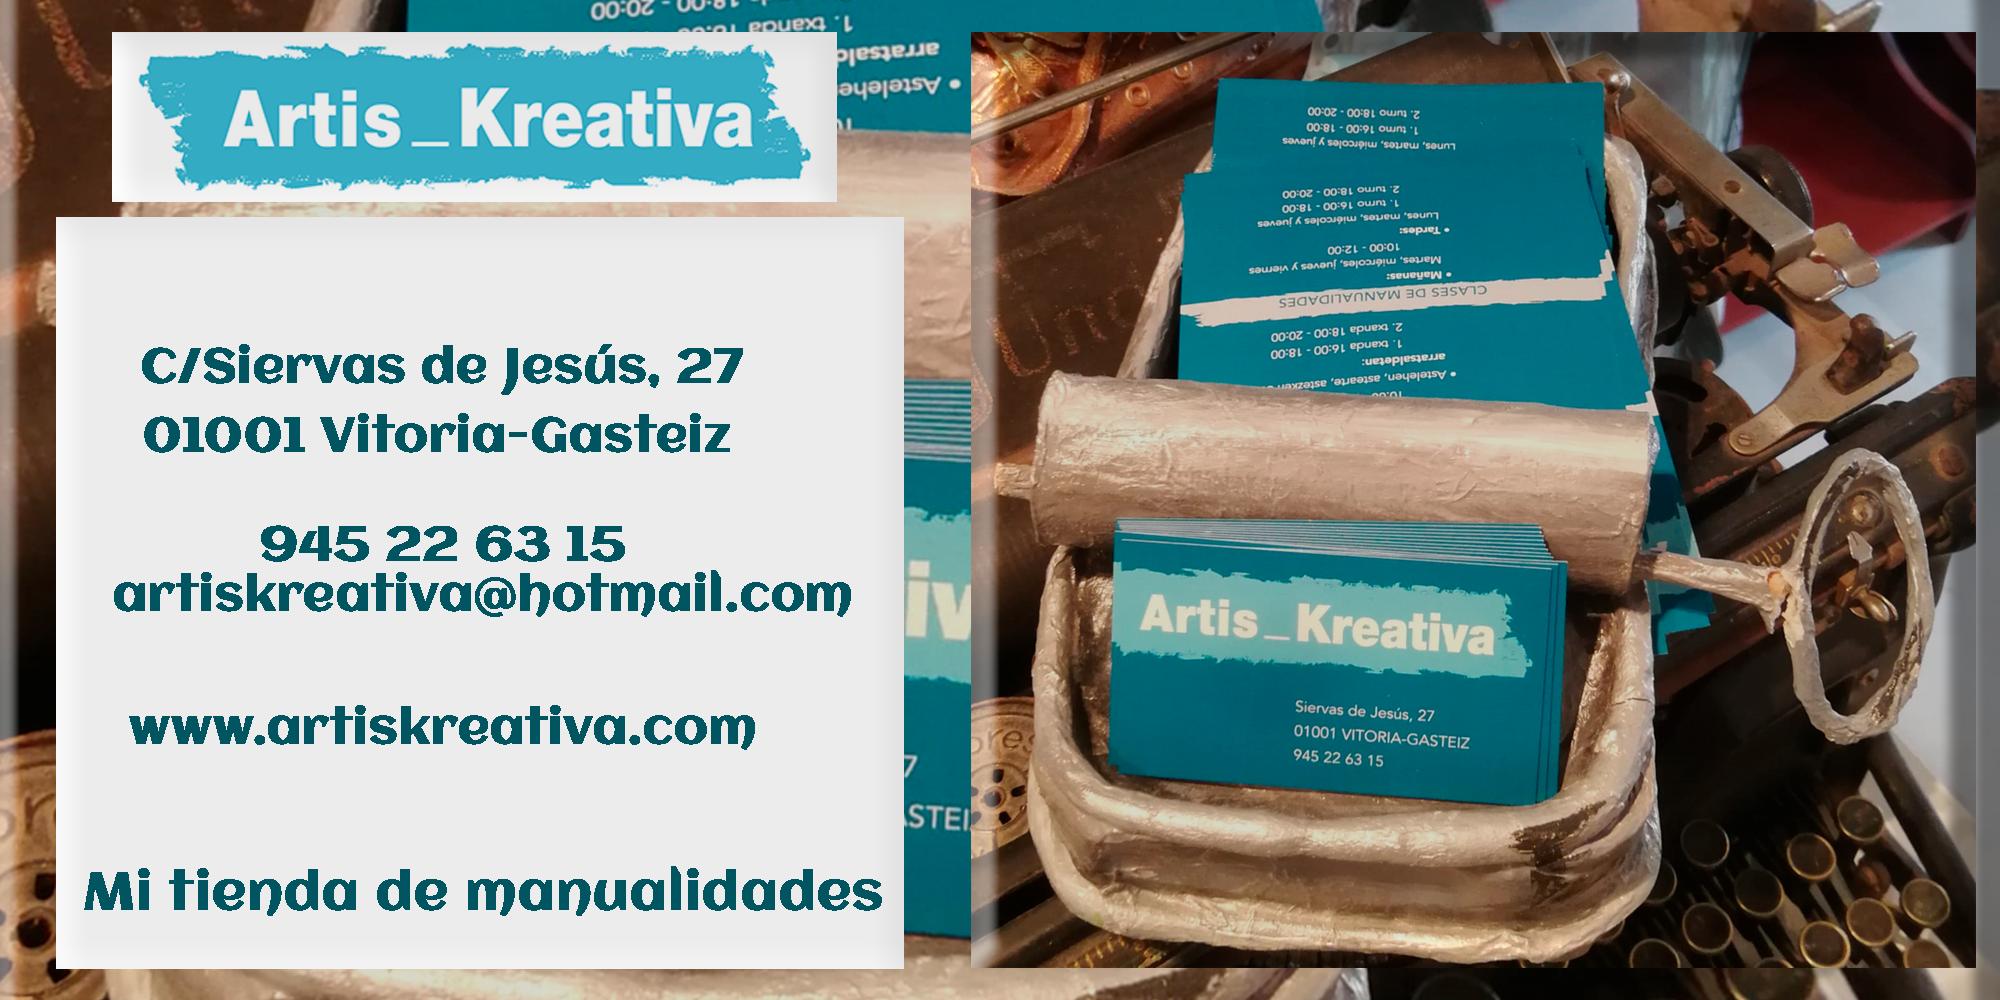 Portada_Direccion_artis